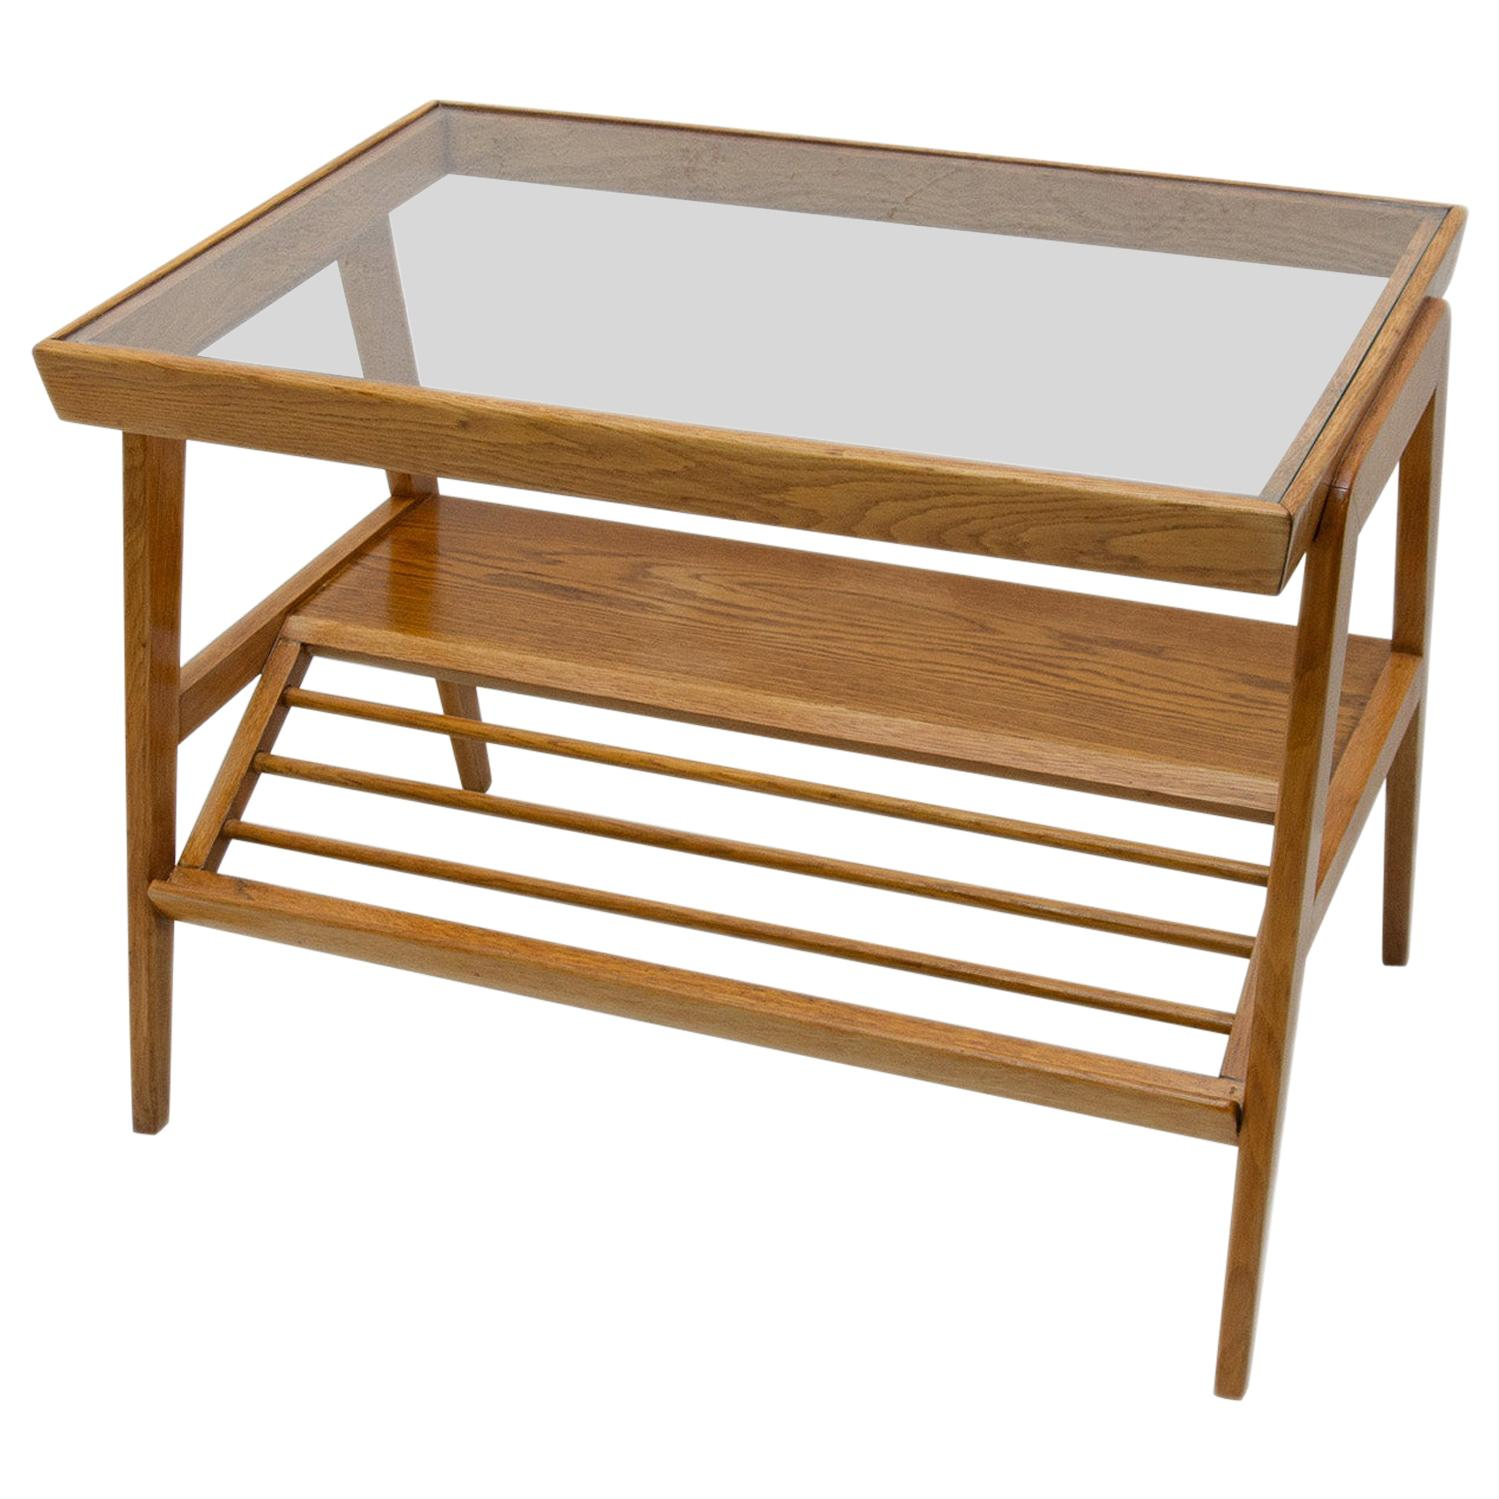 Midcentury Glazed Coffee or Side Table, Czechoslovakia, 1960s